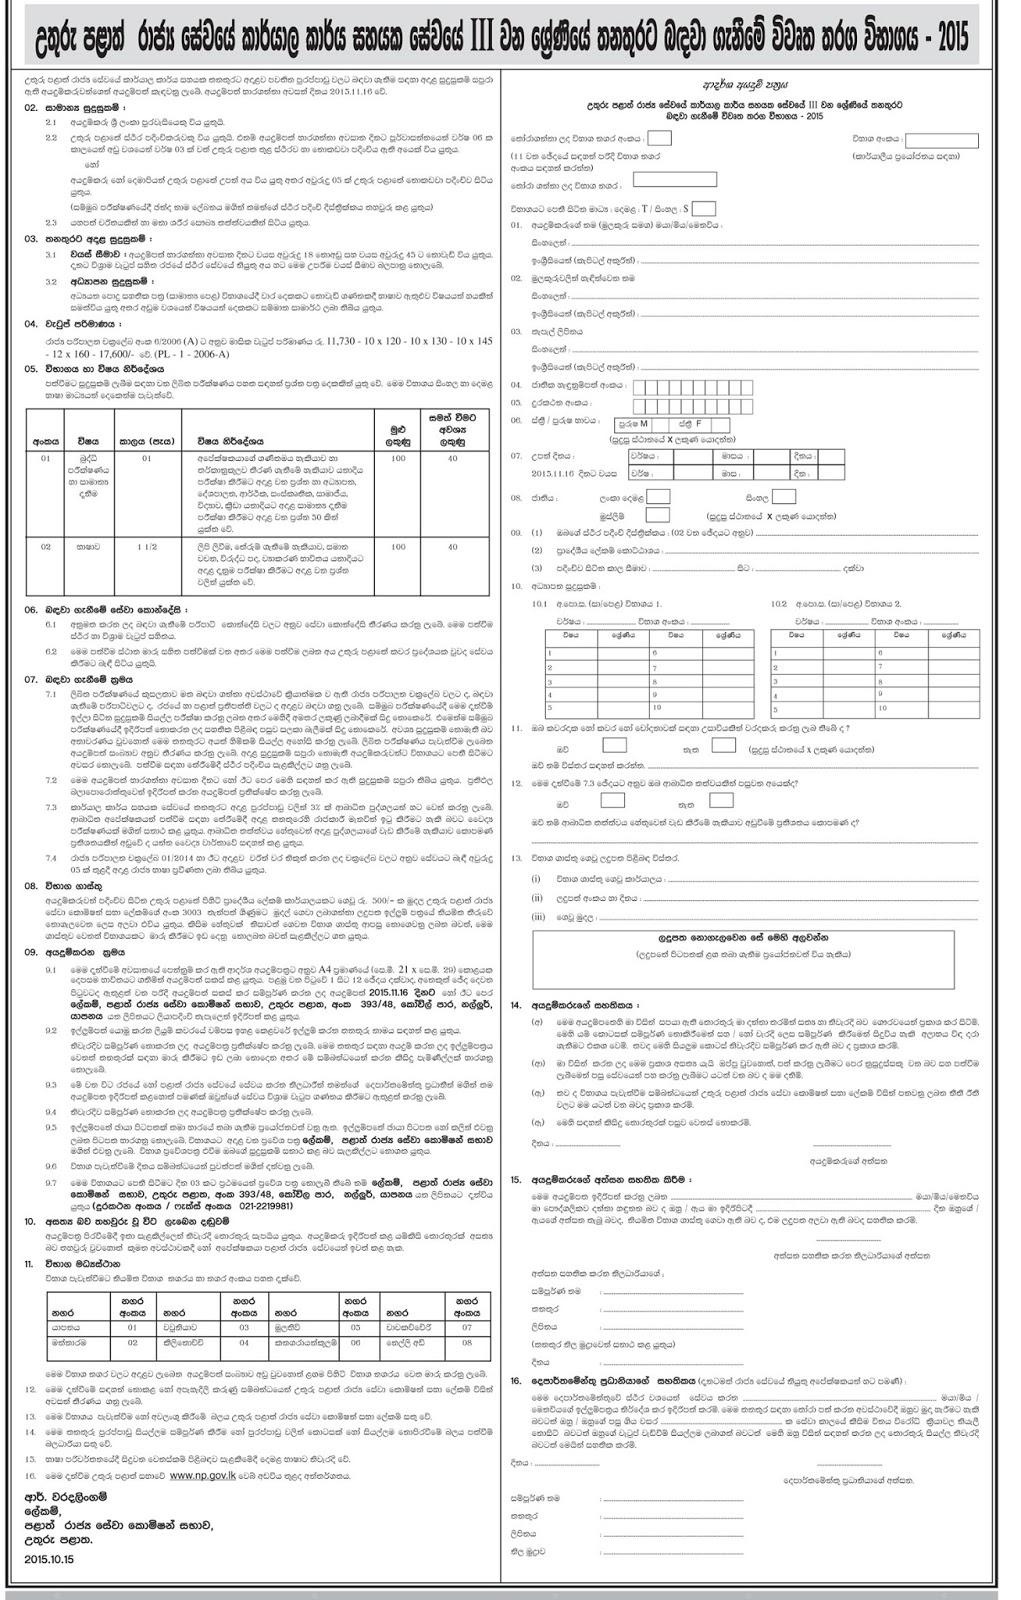 Pe Teacher Job Application Form Choice Image Example Ideas Images